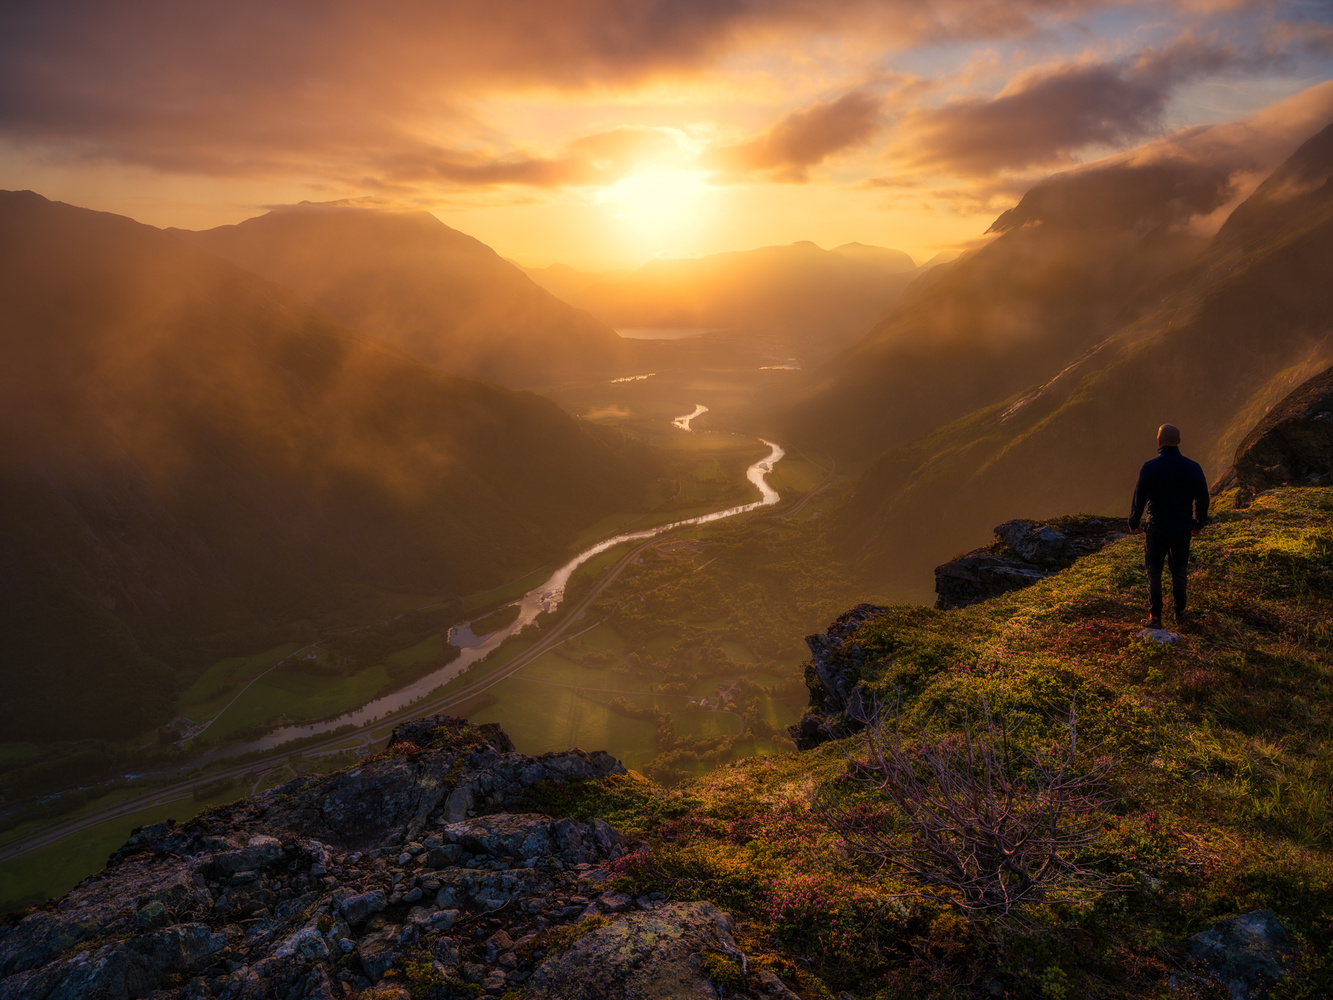 Close to the Edge by Ole Henrik Skjelstad